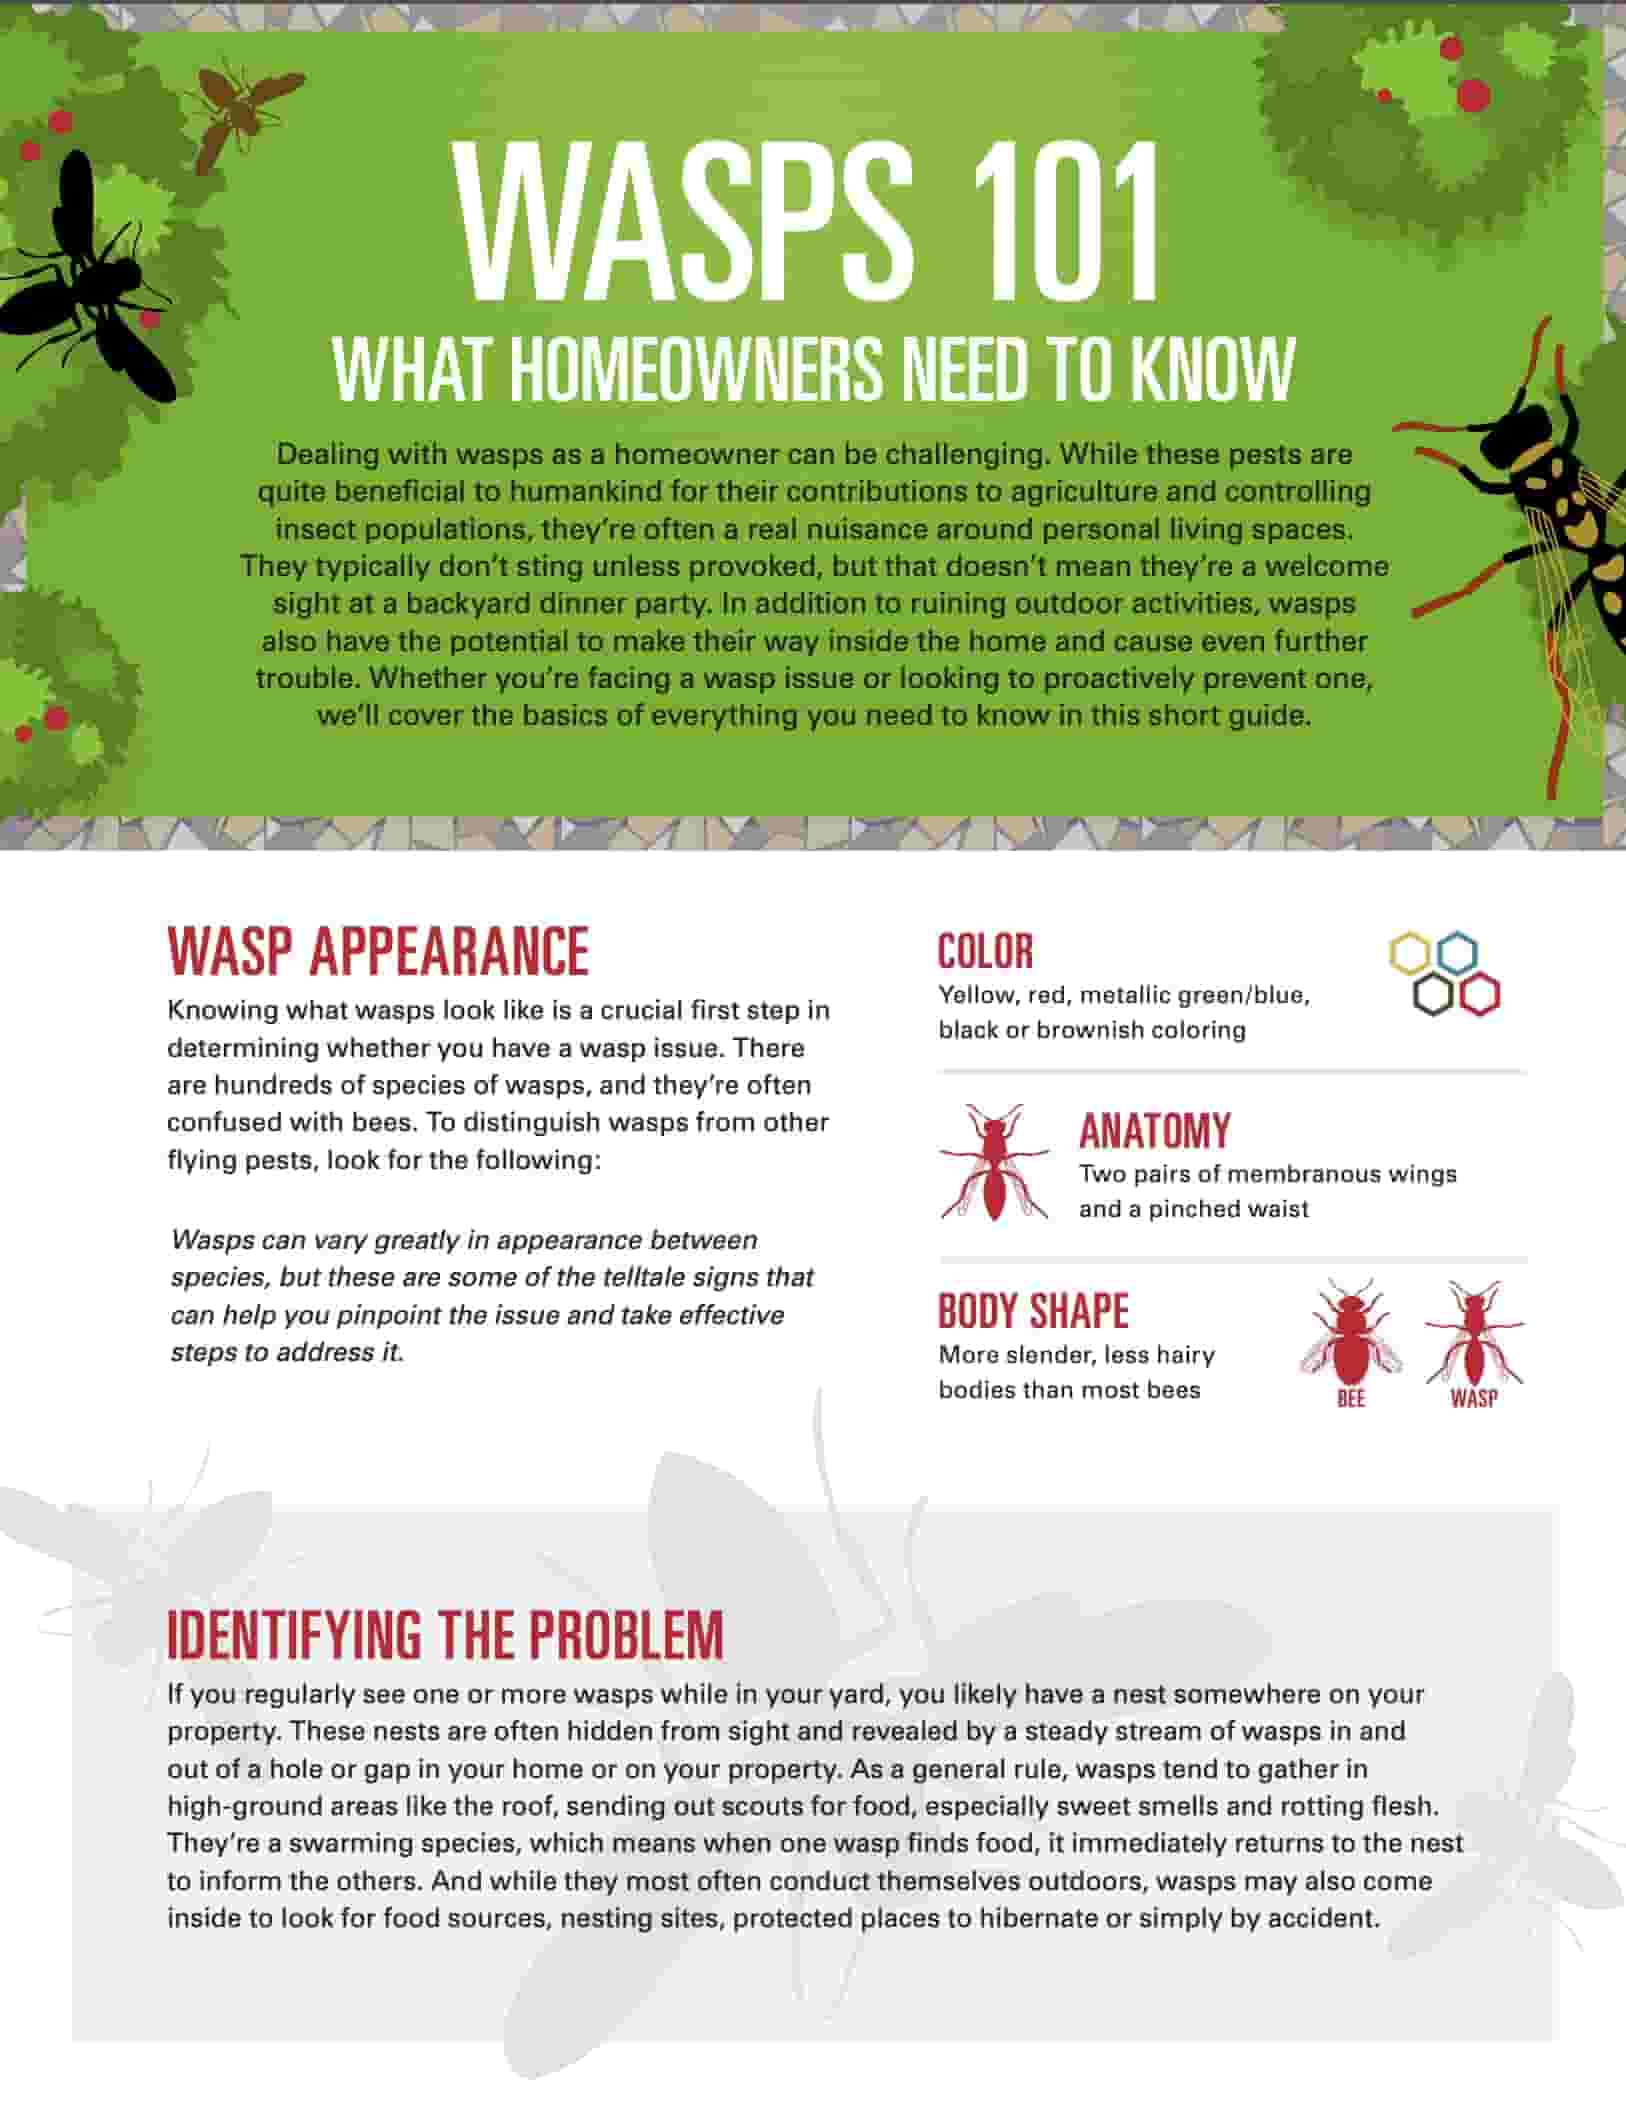 Homeowners guide to keeping wasps at bay